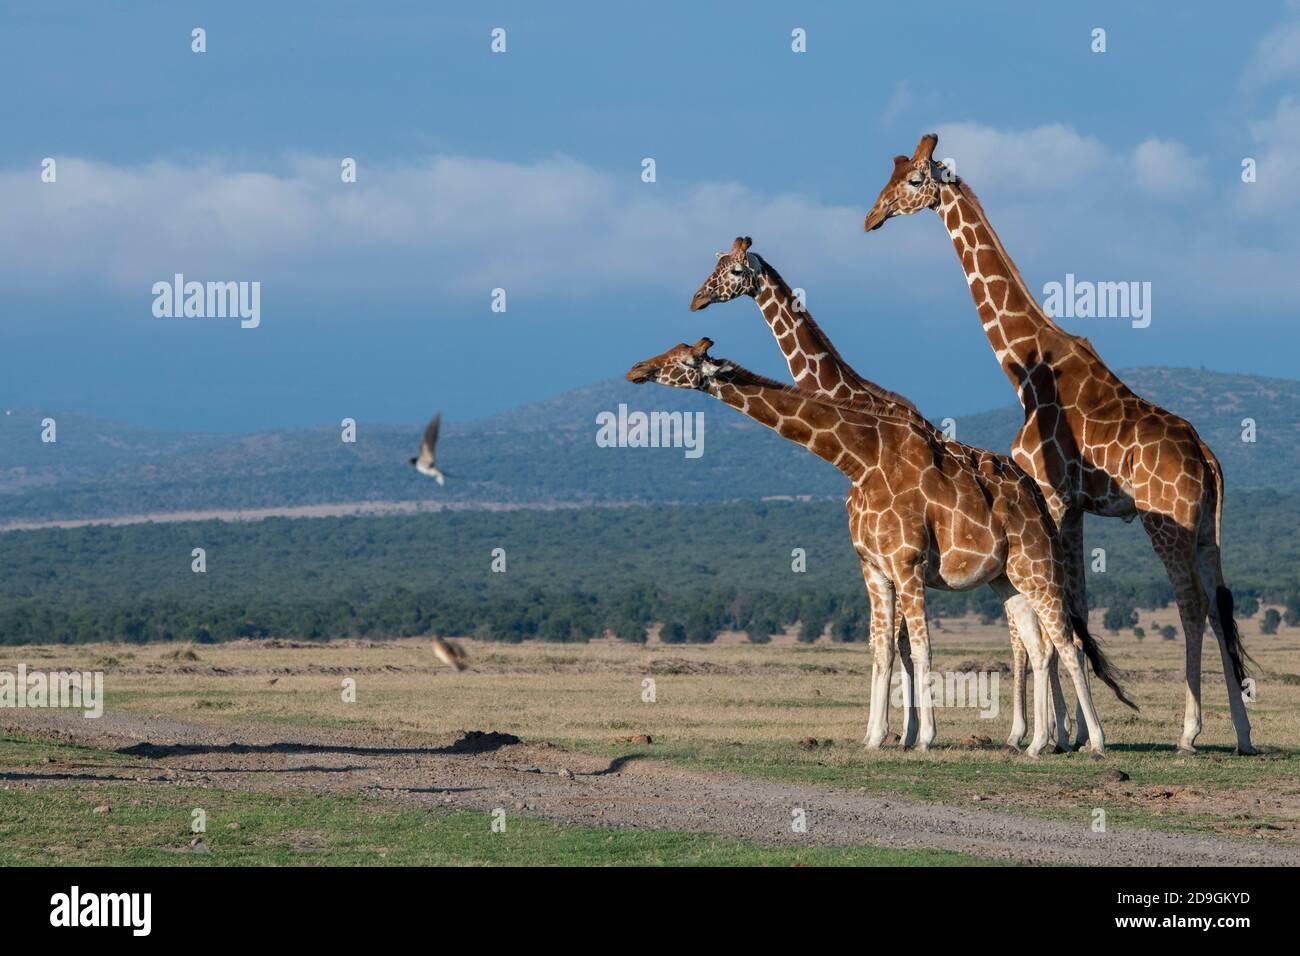 África, Kenia, Meseta de Laikipia, Distrito fronterizo Norte, Ol Pejeta Conservancy. Jirafas reticuladas (SILVESTRE: Giraffa camelopardalis reticulata) Foto de stock